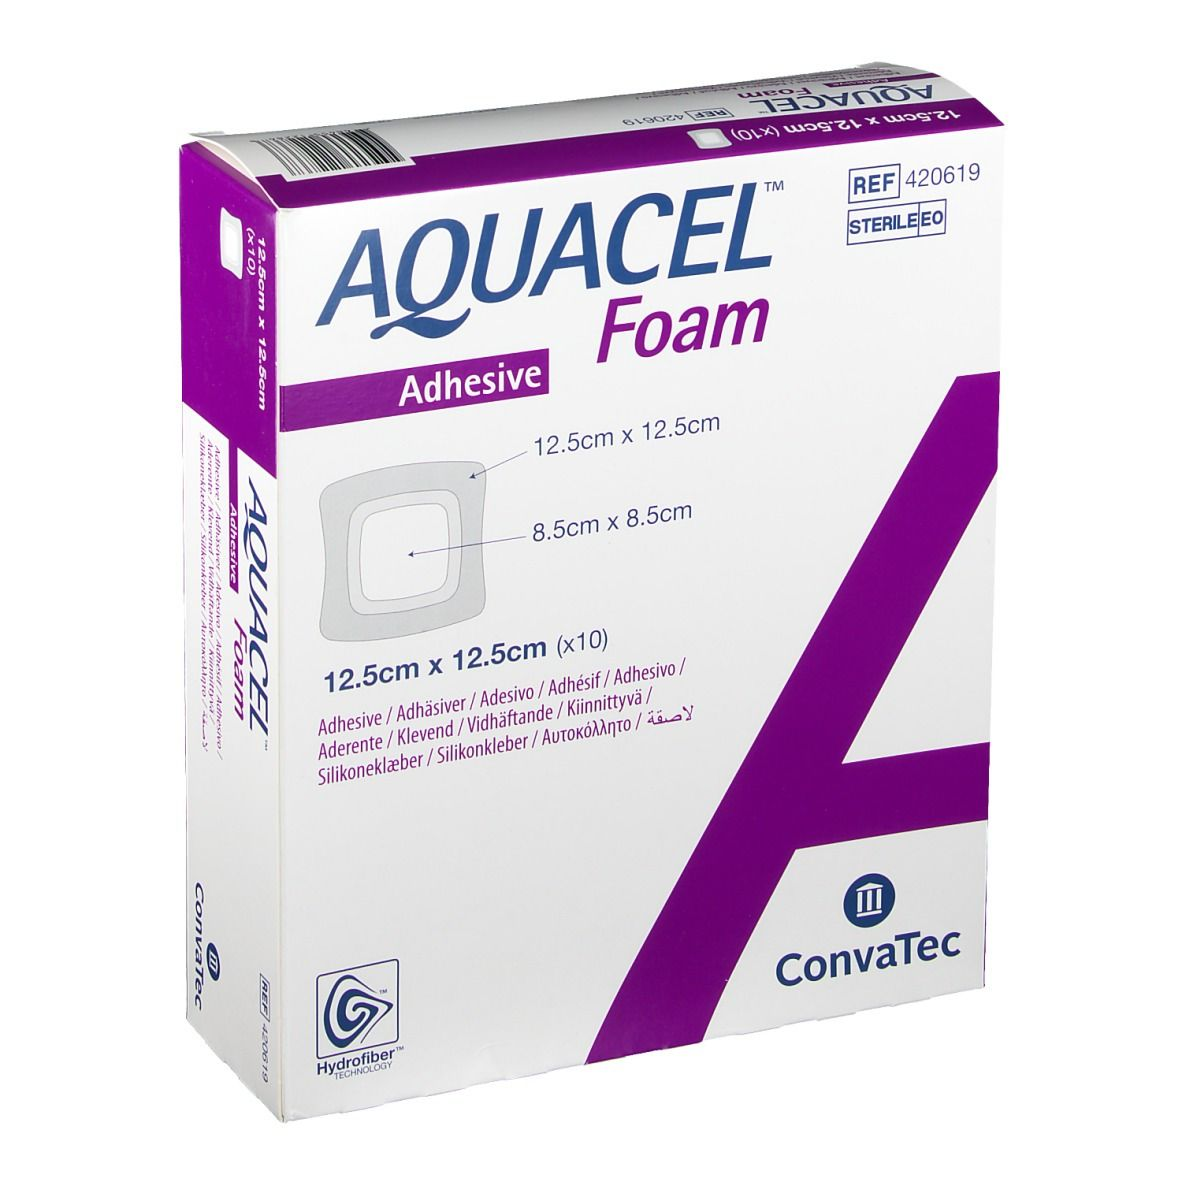 AQUACEL FOAM ADH 12.5X12.5